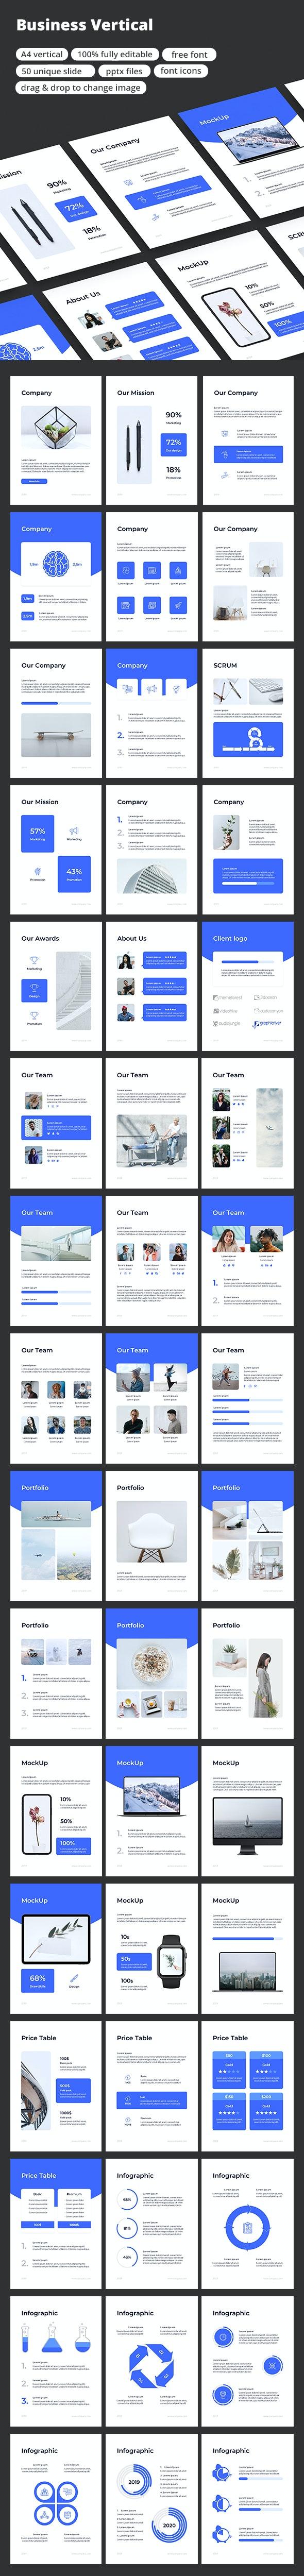 Business Vertical - PowerPoint Template - Business PowerPoint Templates